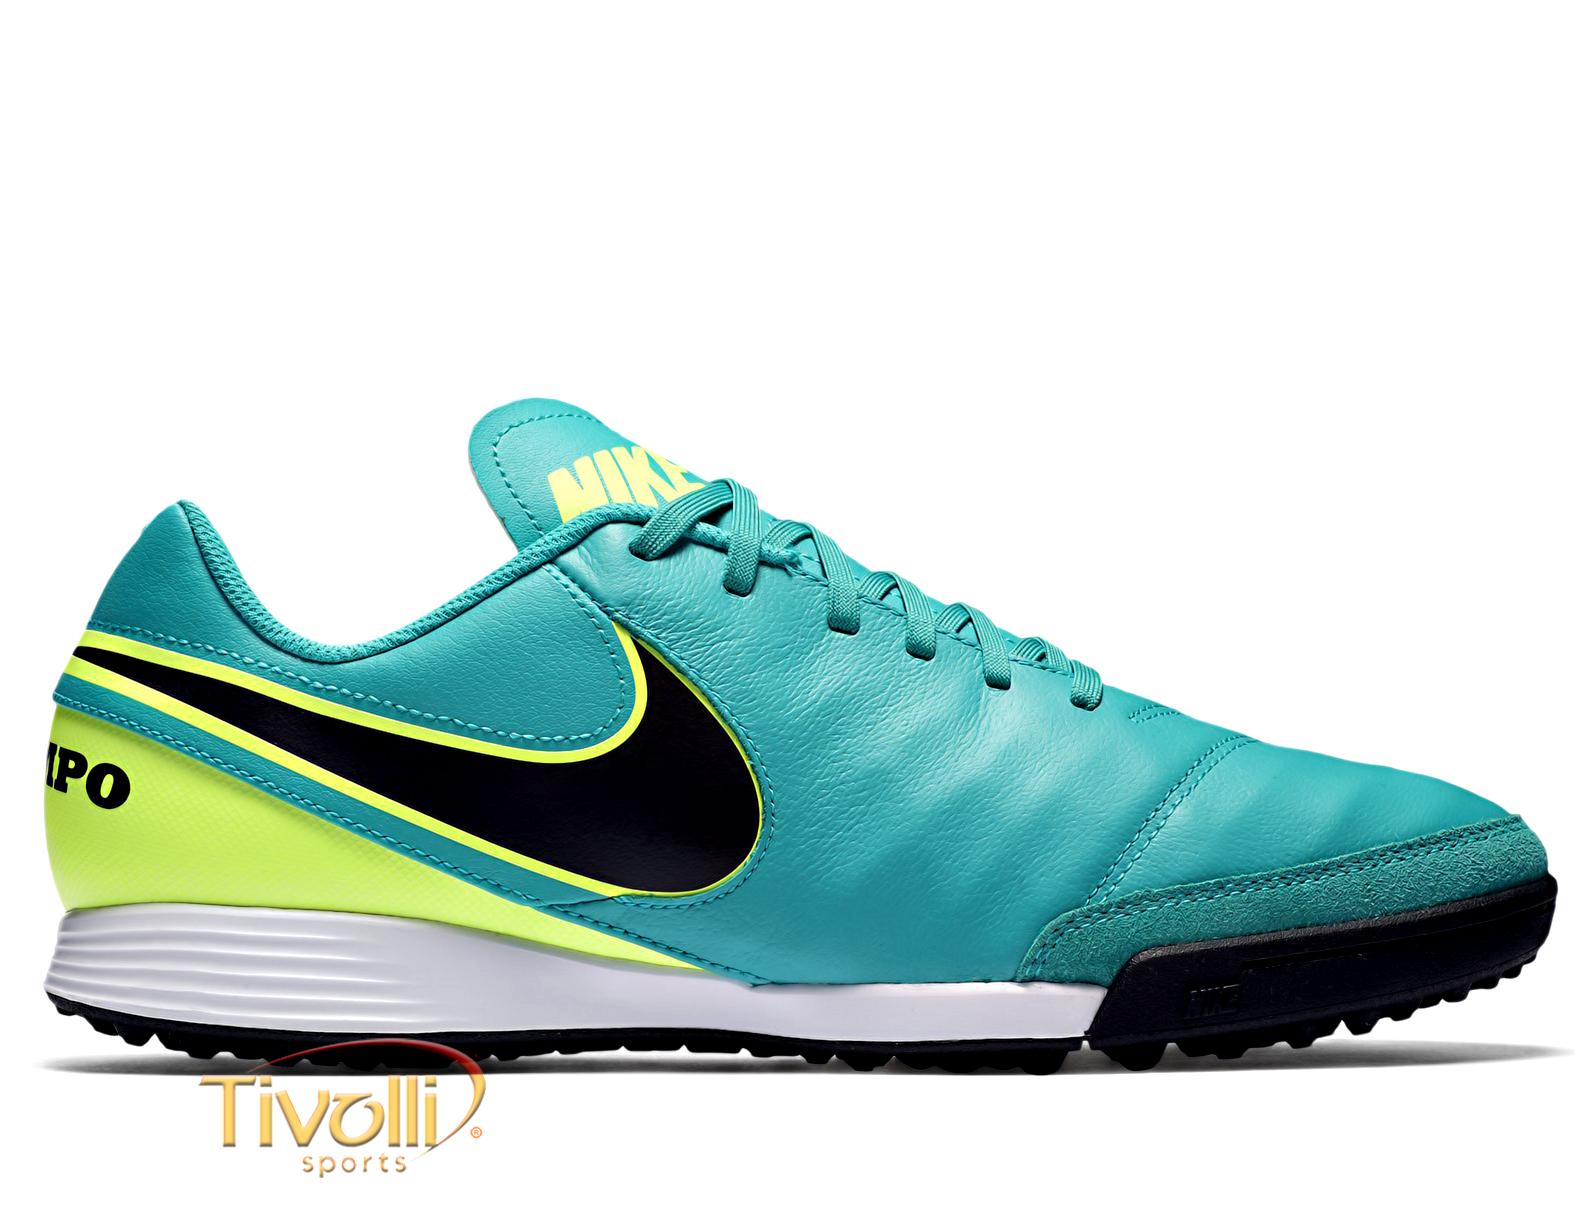 Chuteira Nike Tiempo Genio II Leather TF Society     80f5788082d9c